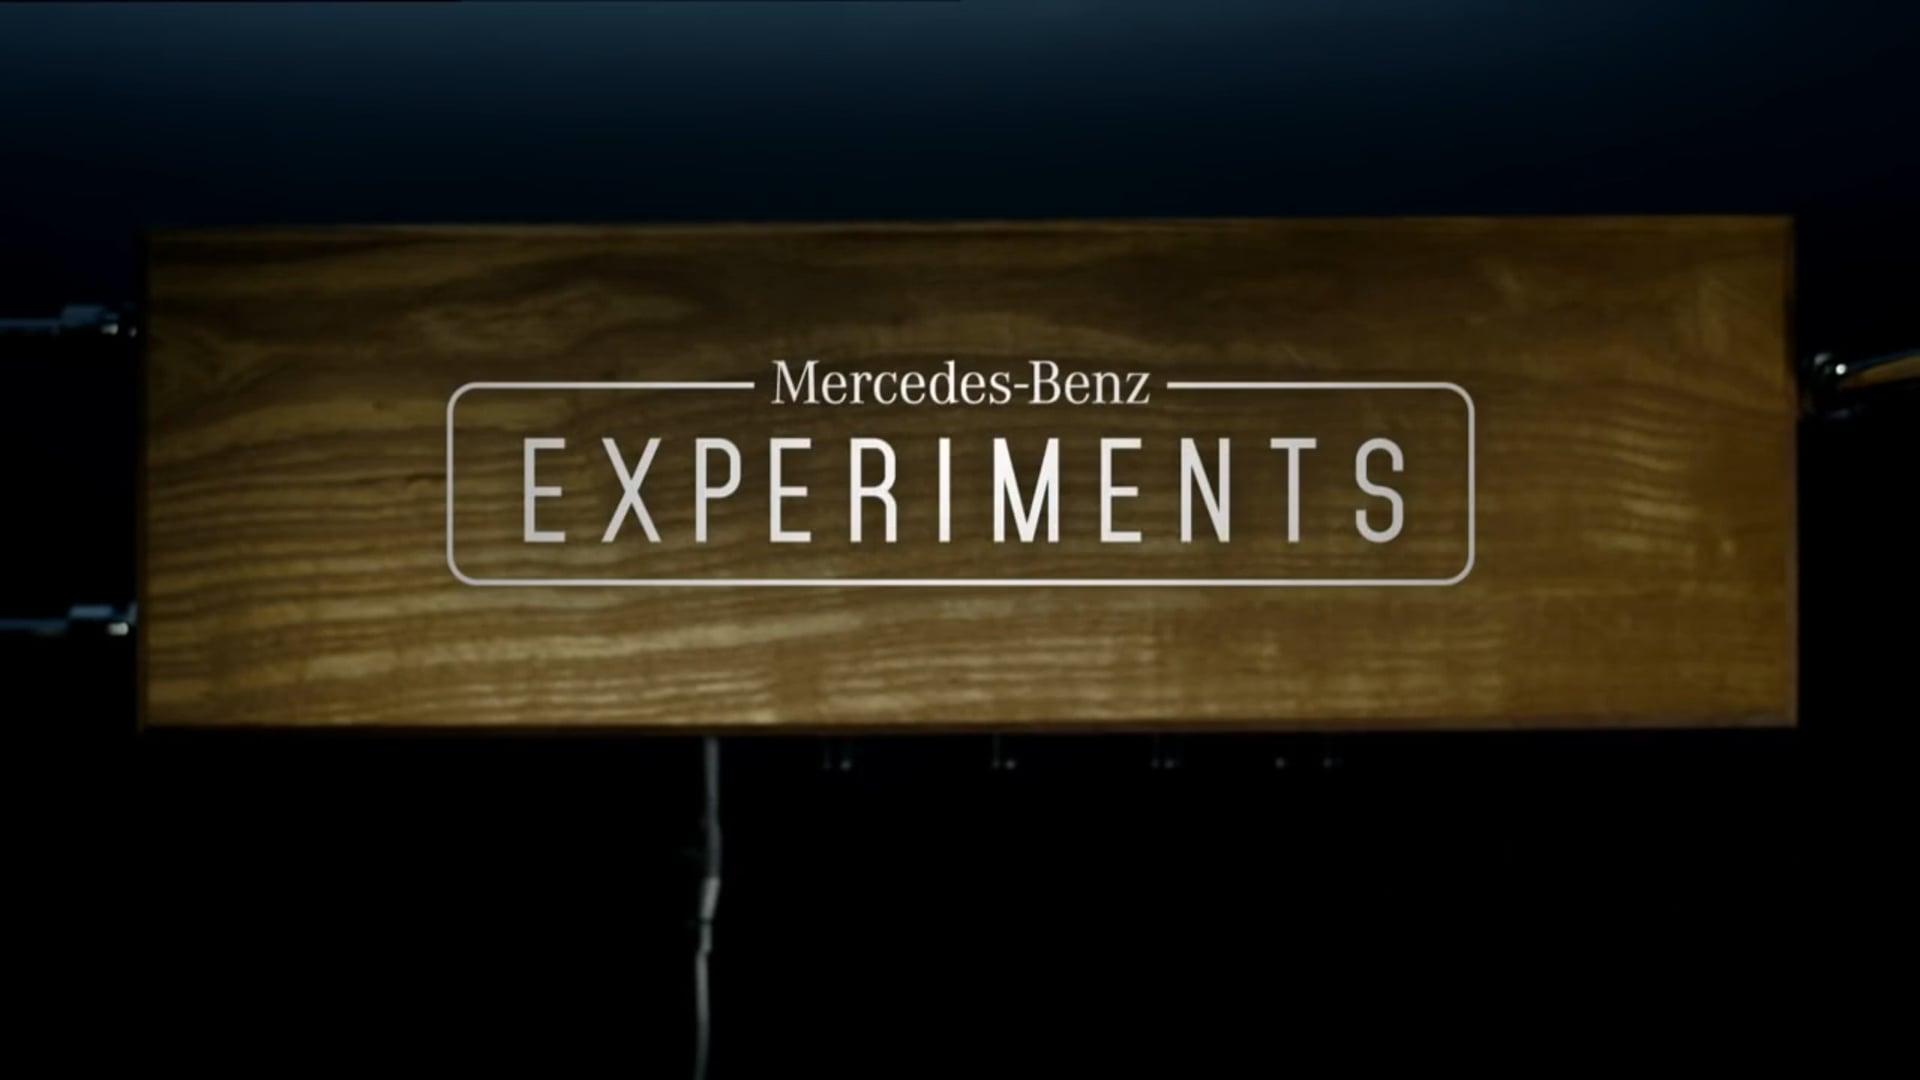 Mercedes-Benz - Experiments: Gestures